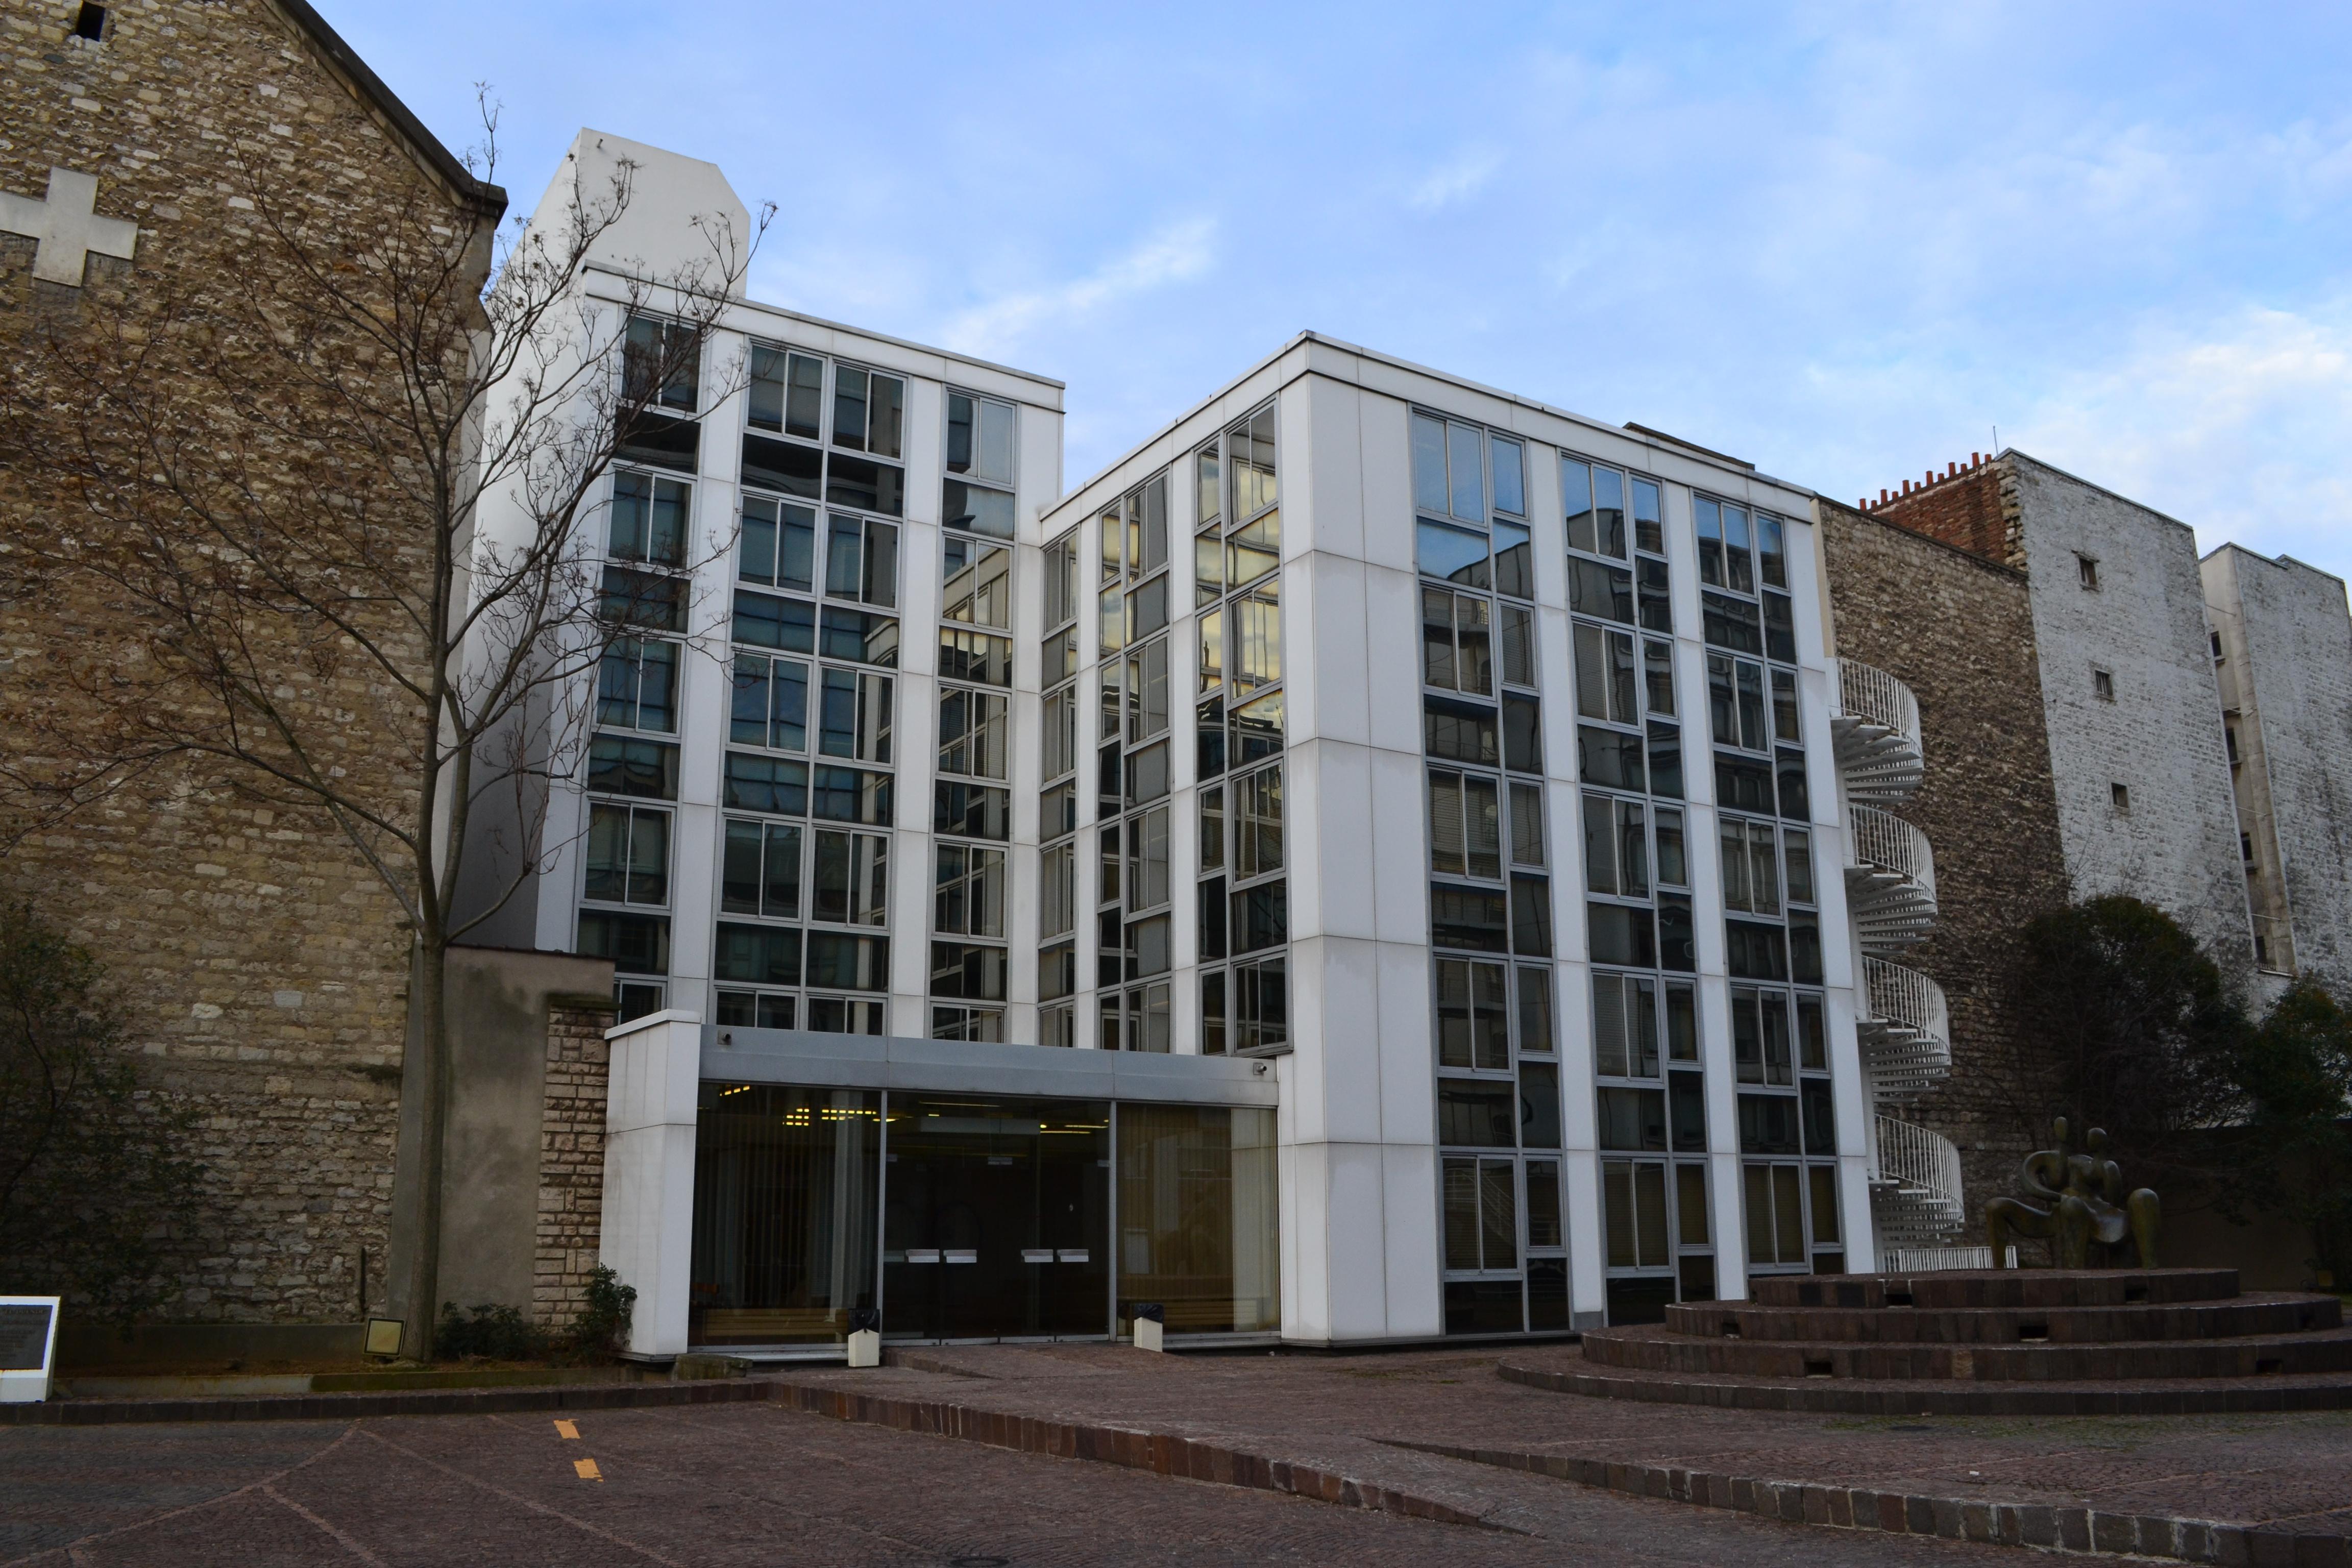 Unesco Office in Paris Unu Office at Unesco Building